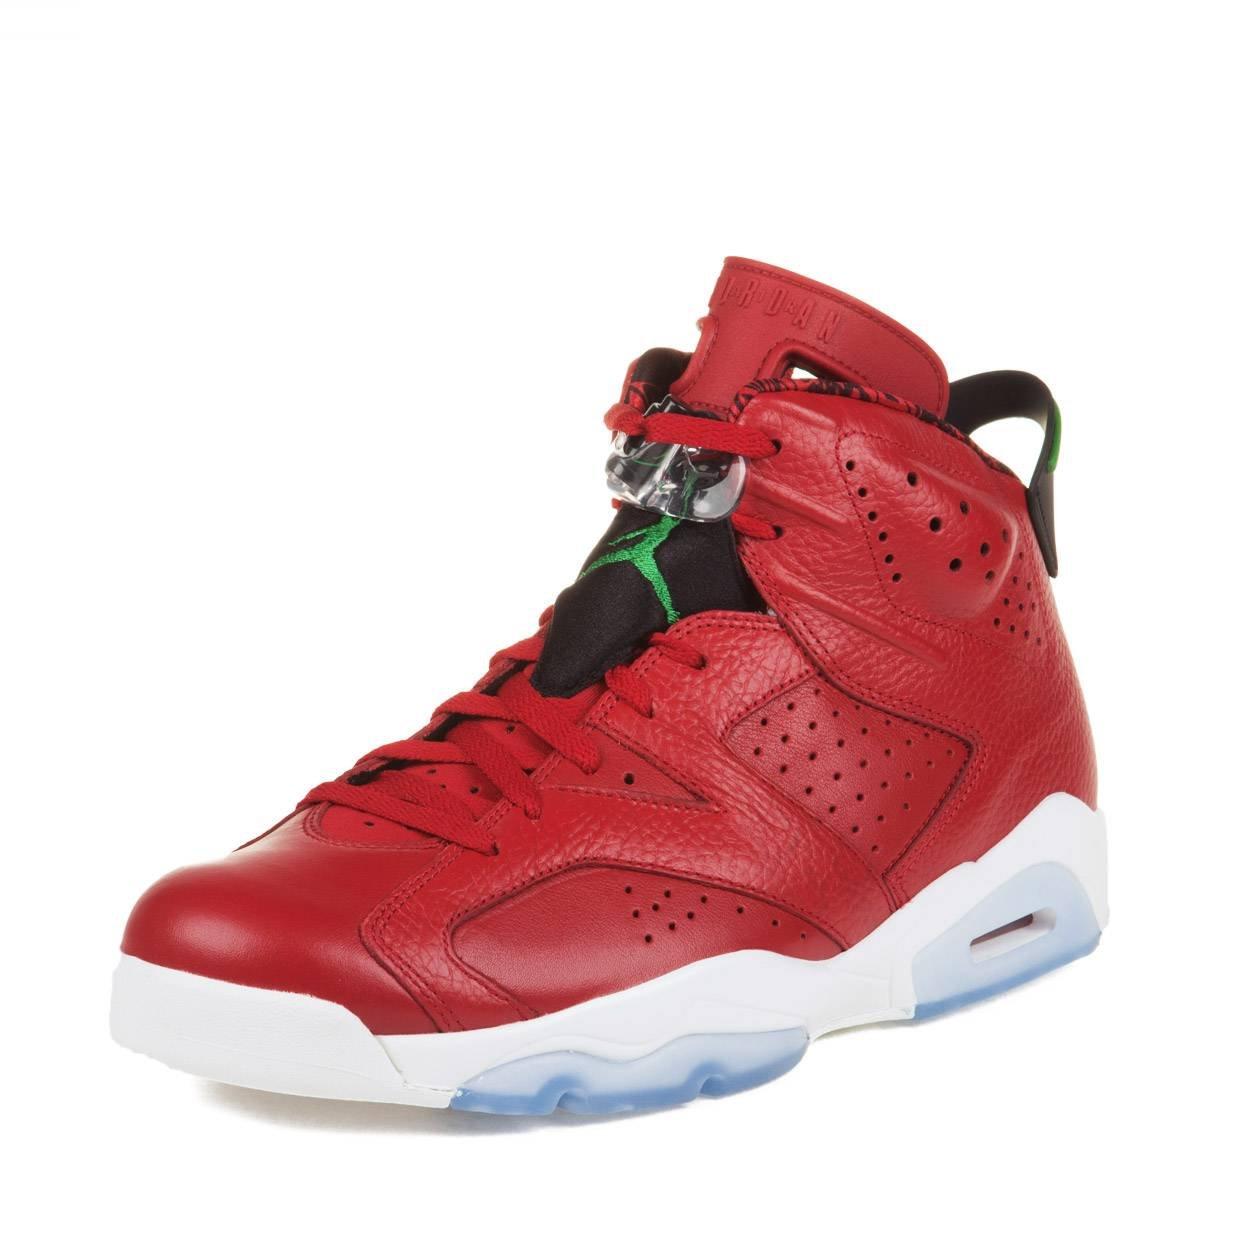 b5df76c3a1b4 Nike air jordan retro spizike jpg 1250x1250 Classic nike basketball shoes